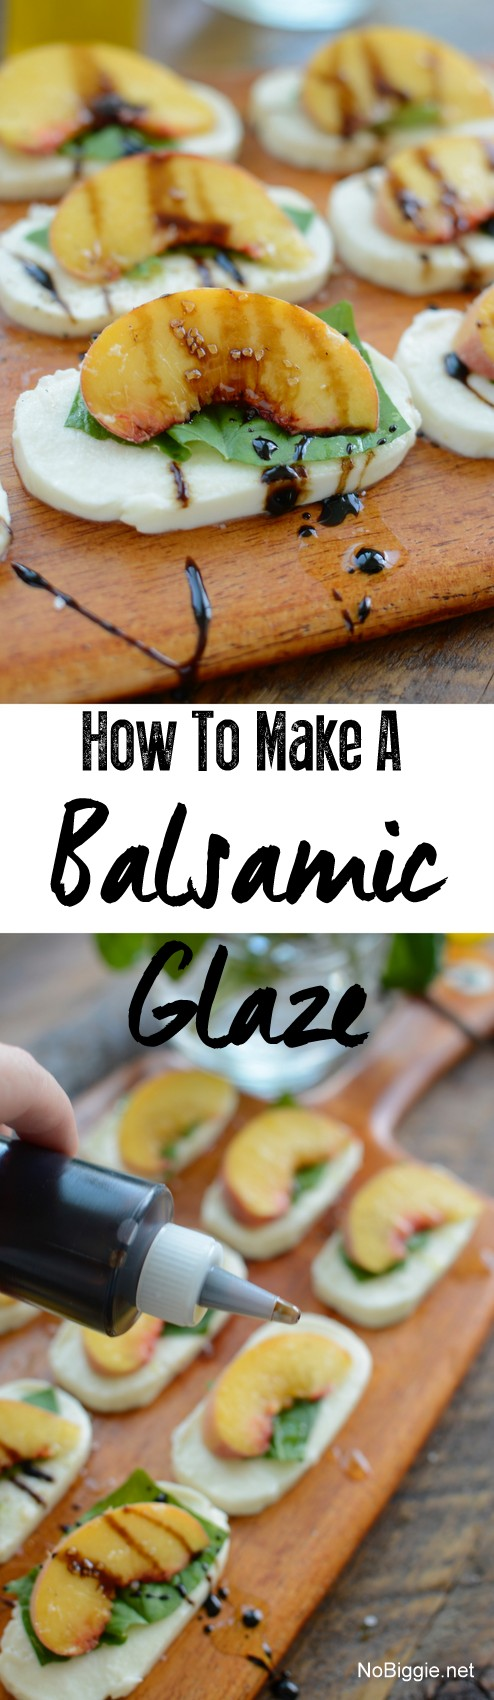 how to make a balsamic glaze | NoBiggie.net